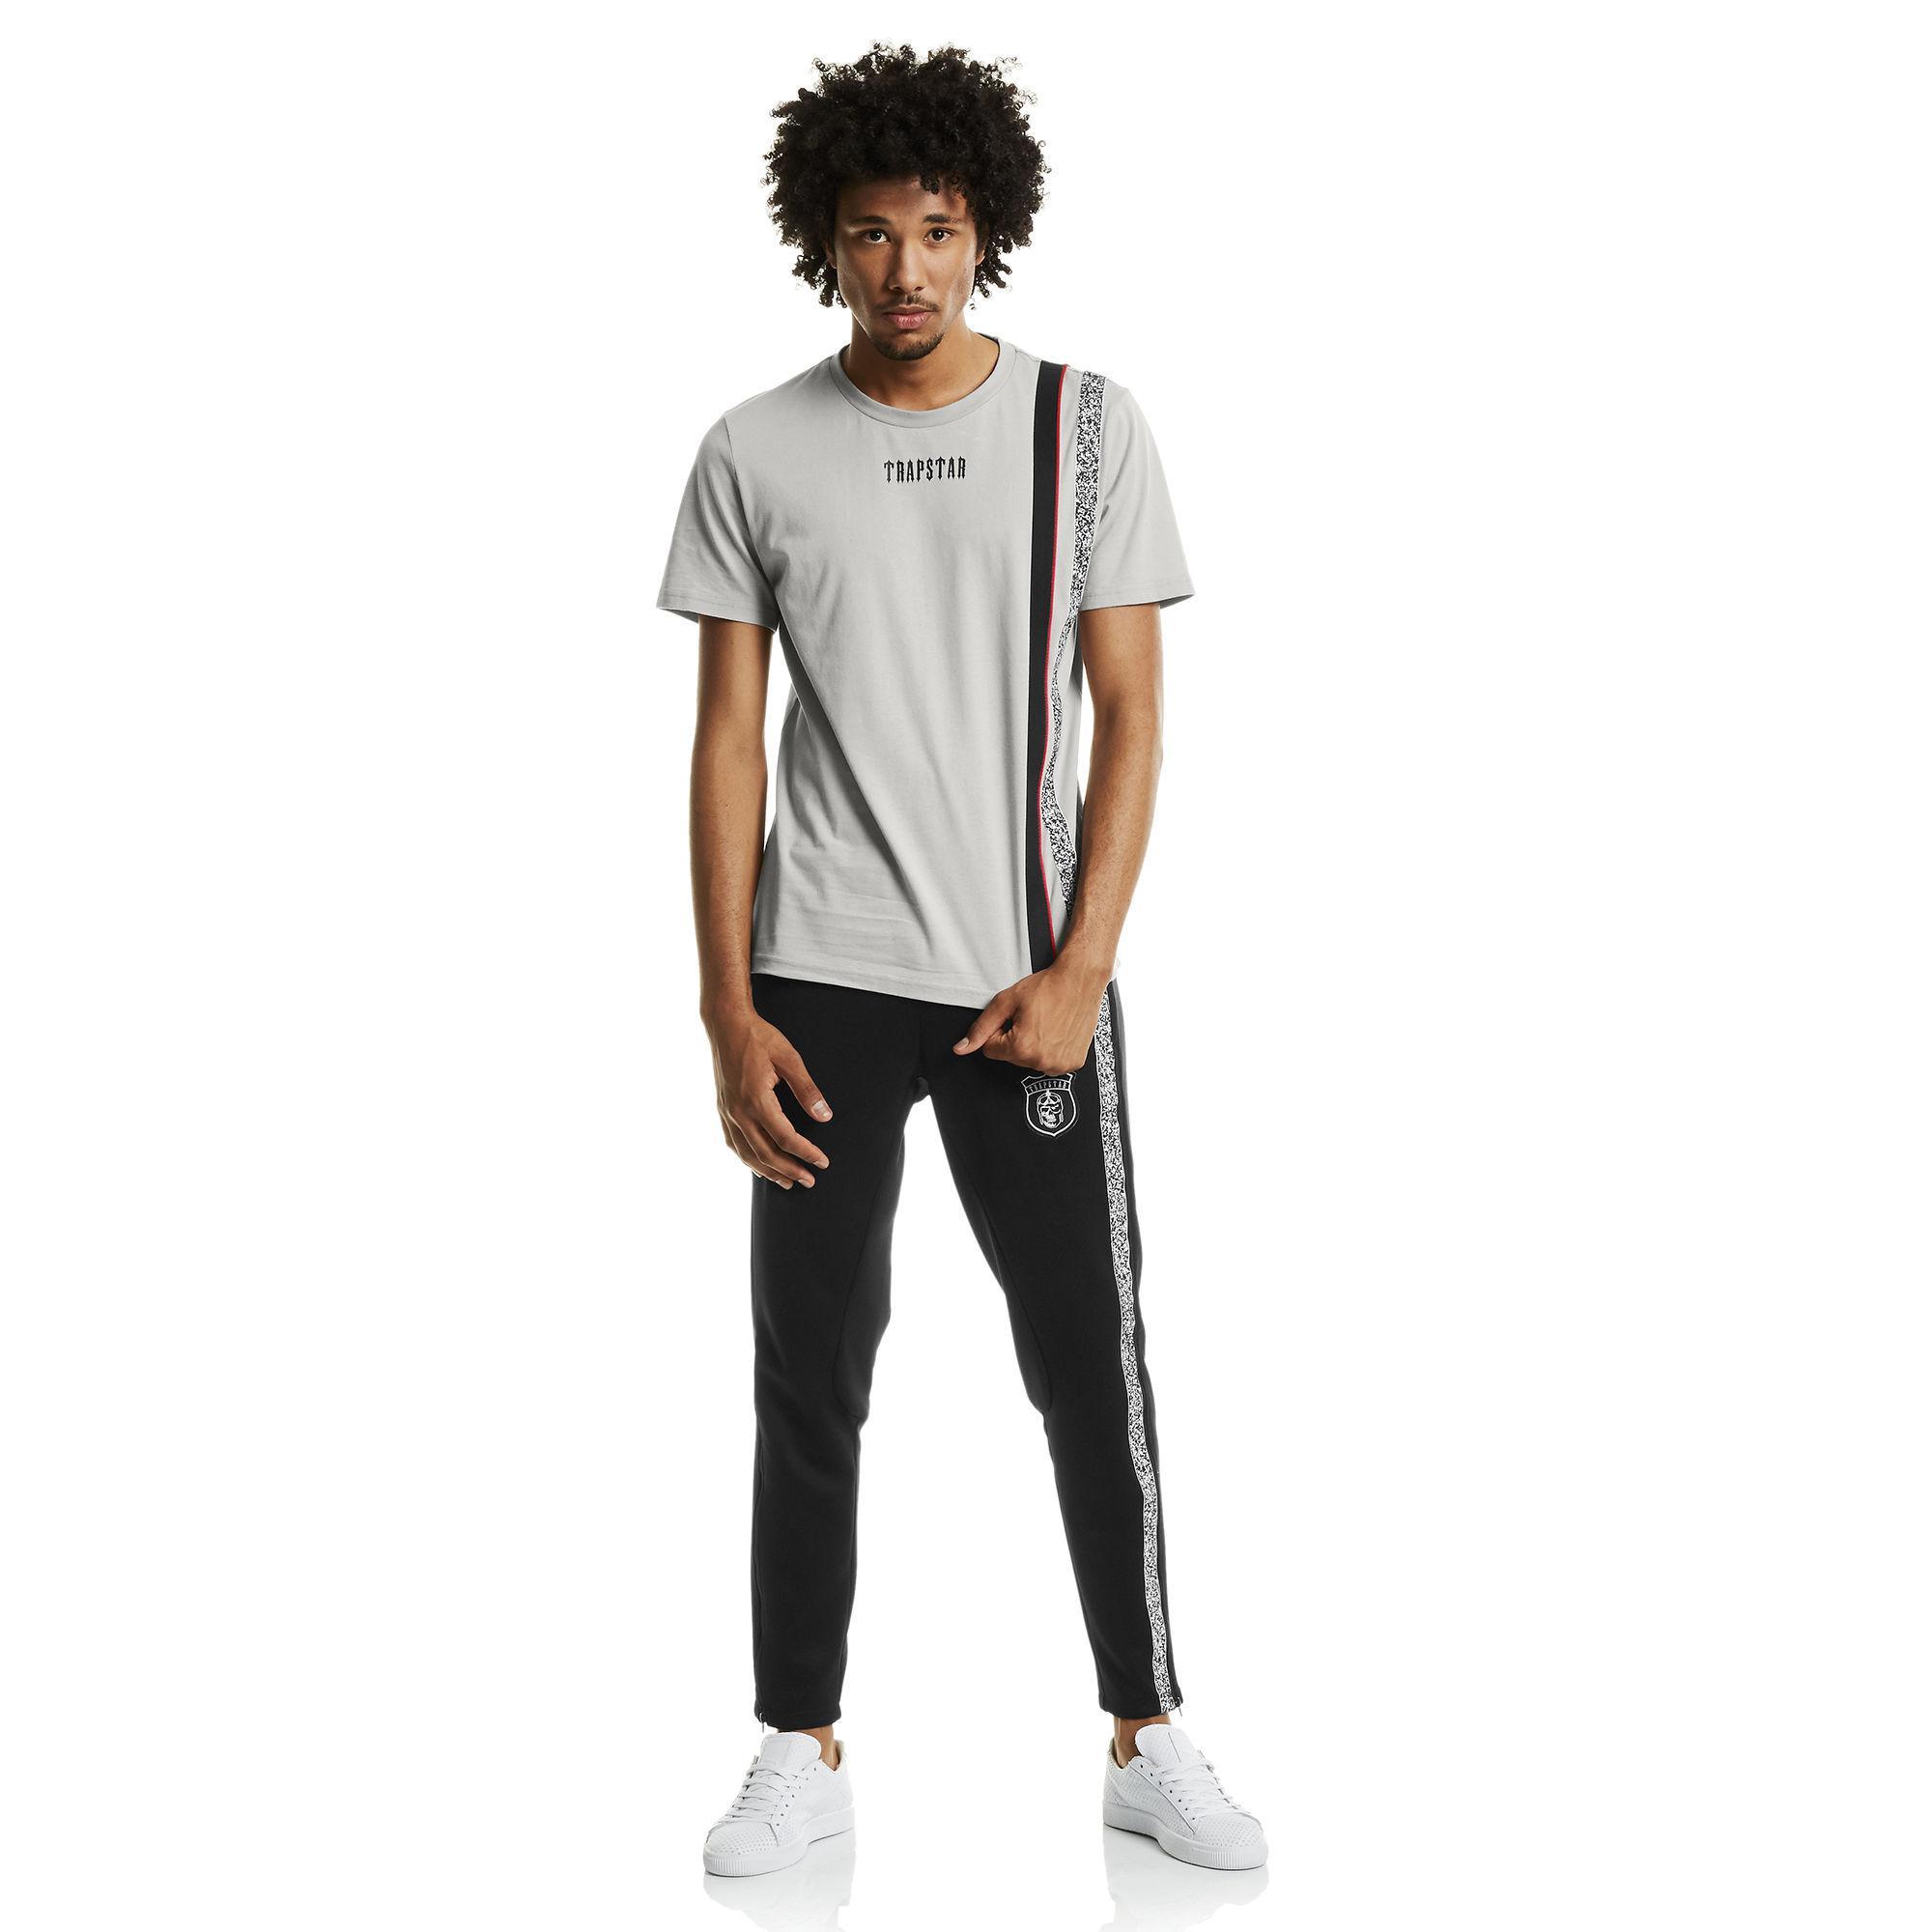 ca6967eefe7a35 Lyst - PUMA X Trapstar Men s T-shirt in Gray for Men